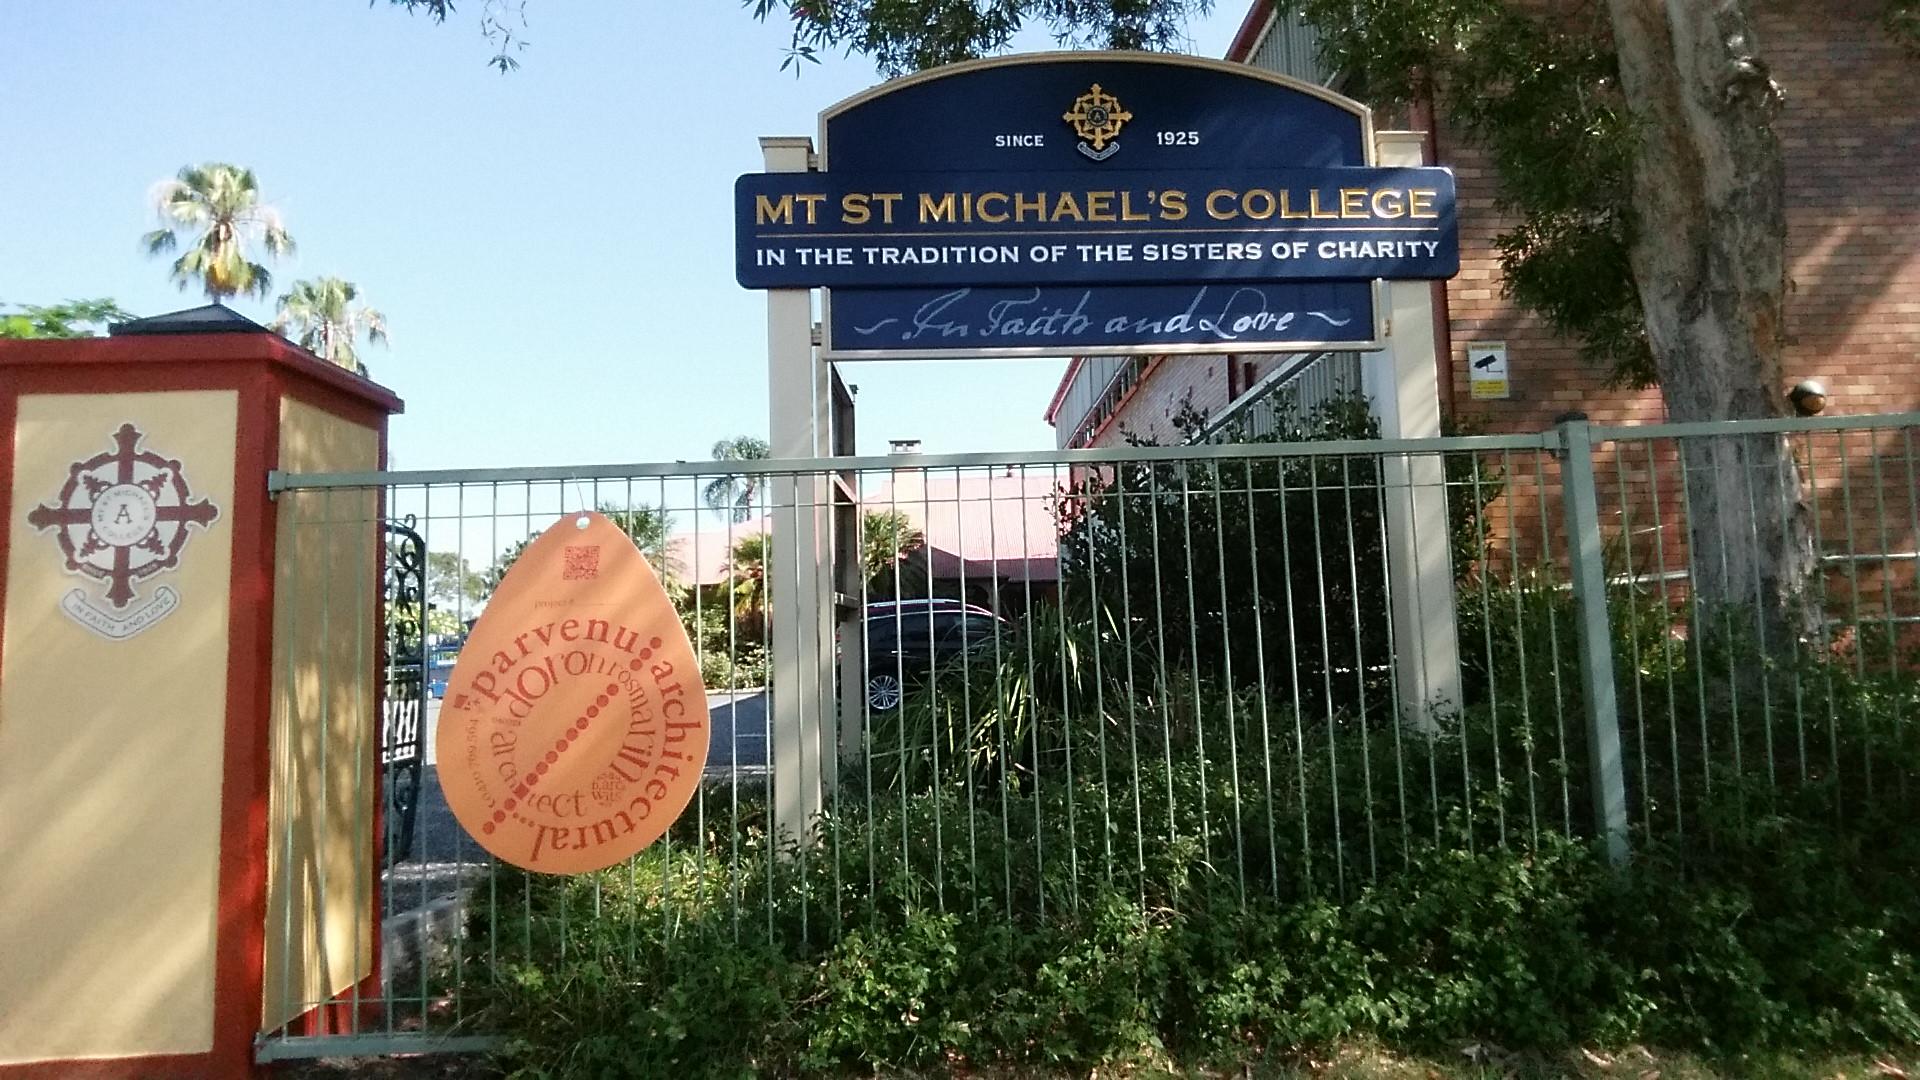 mt st michaels college